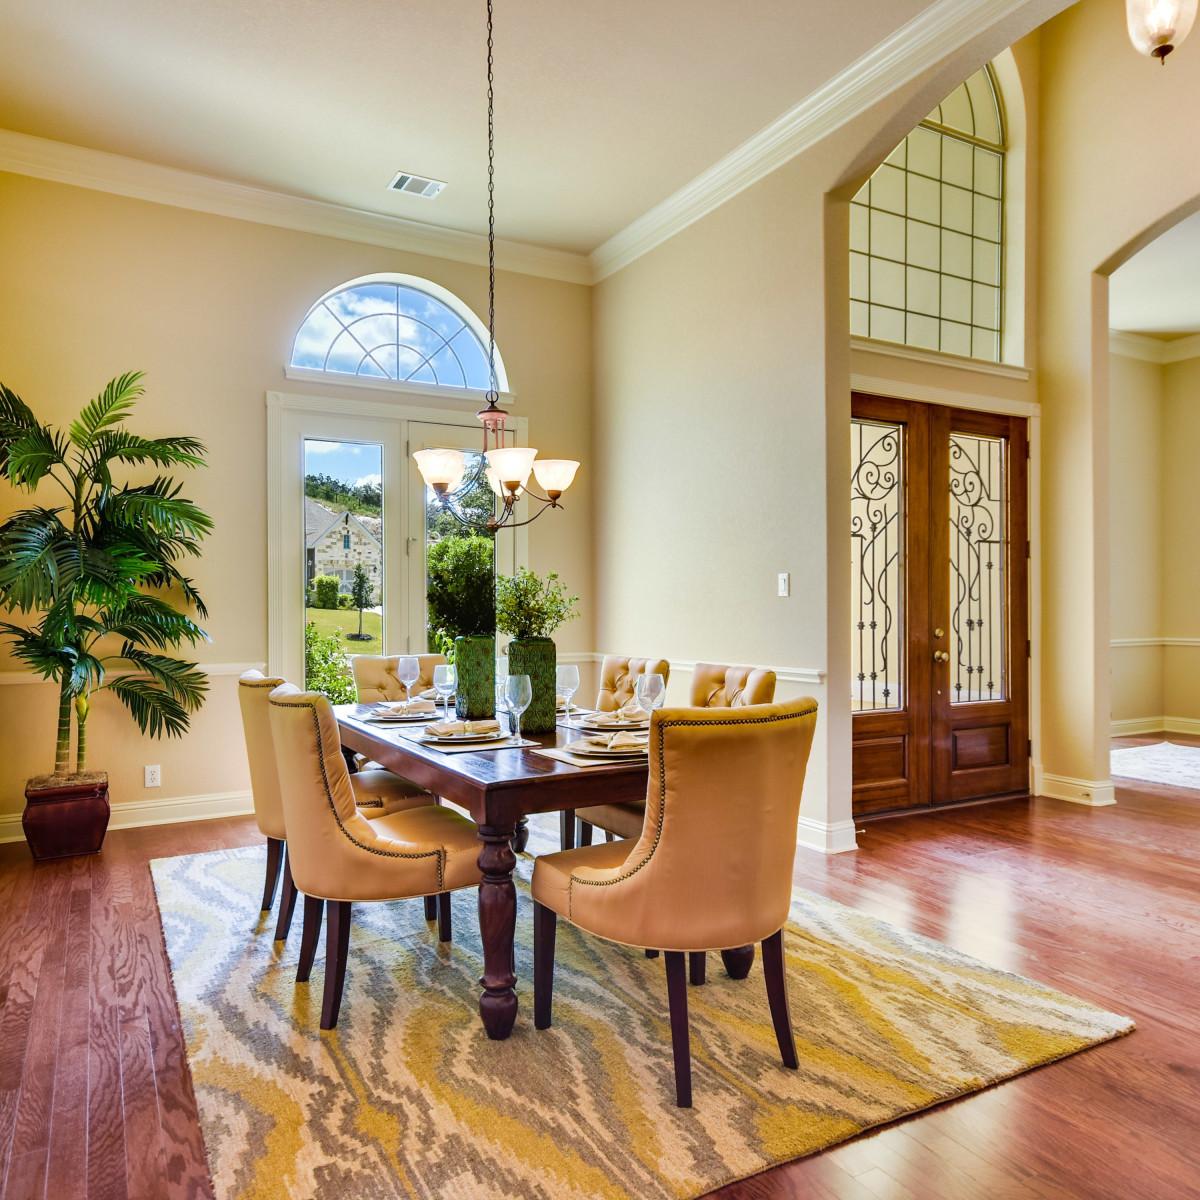 18027 Resort View San Antonio house for sale dining room